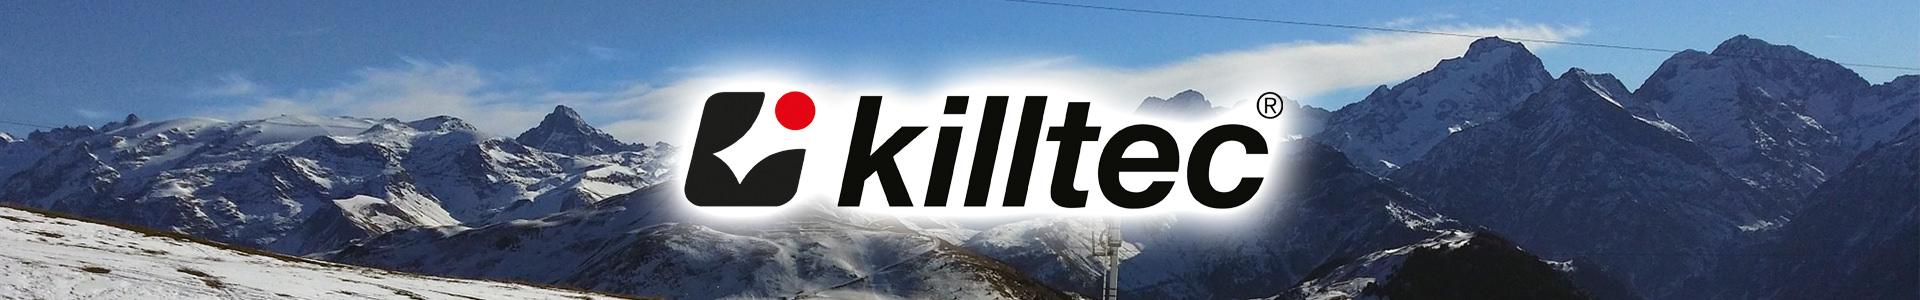 Funktionsbekleidung Marke Killtec